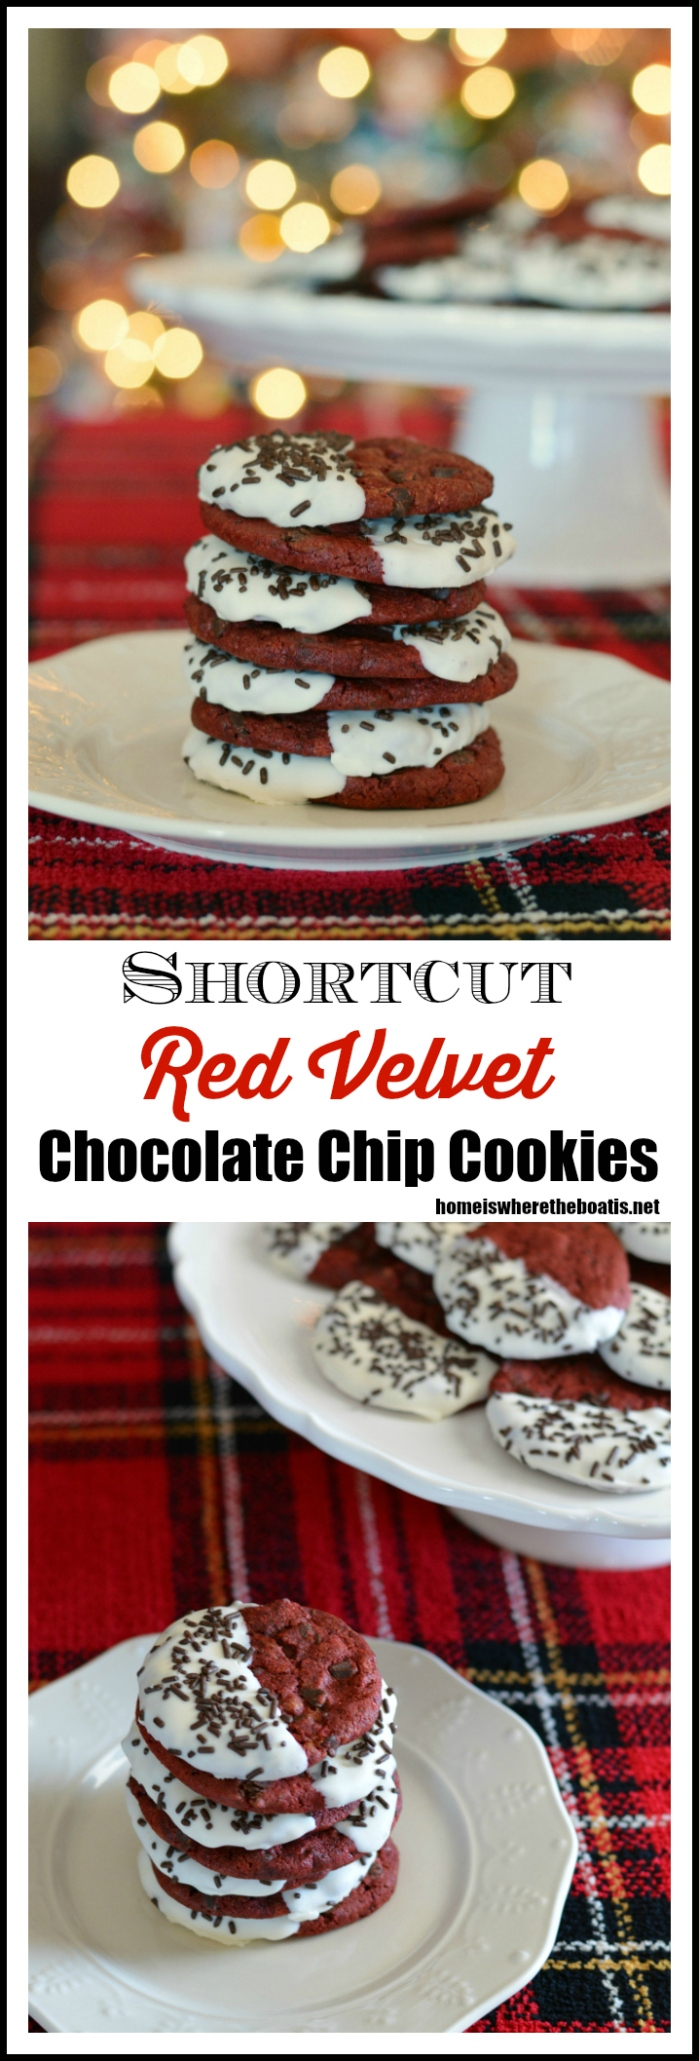 Shortcut Red Velvet Chocolate Chip Cookies